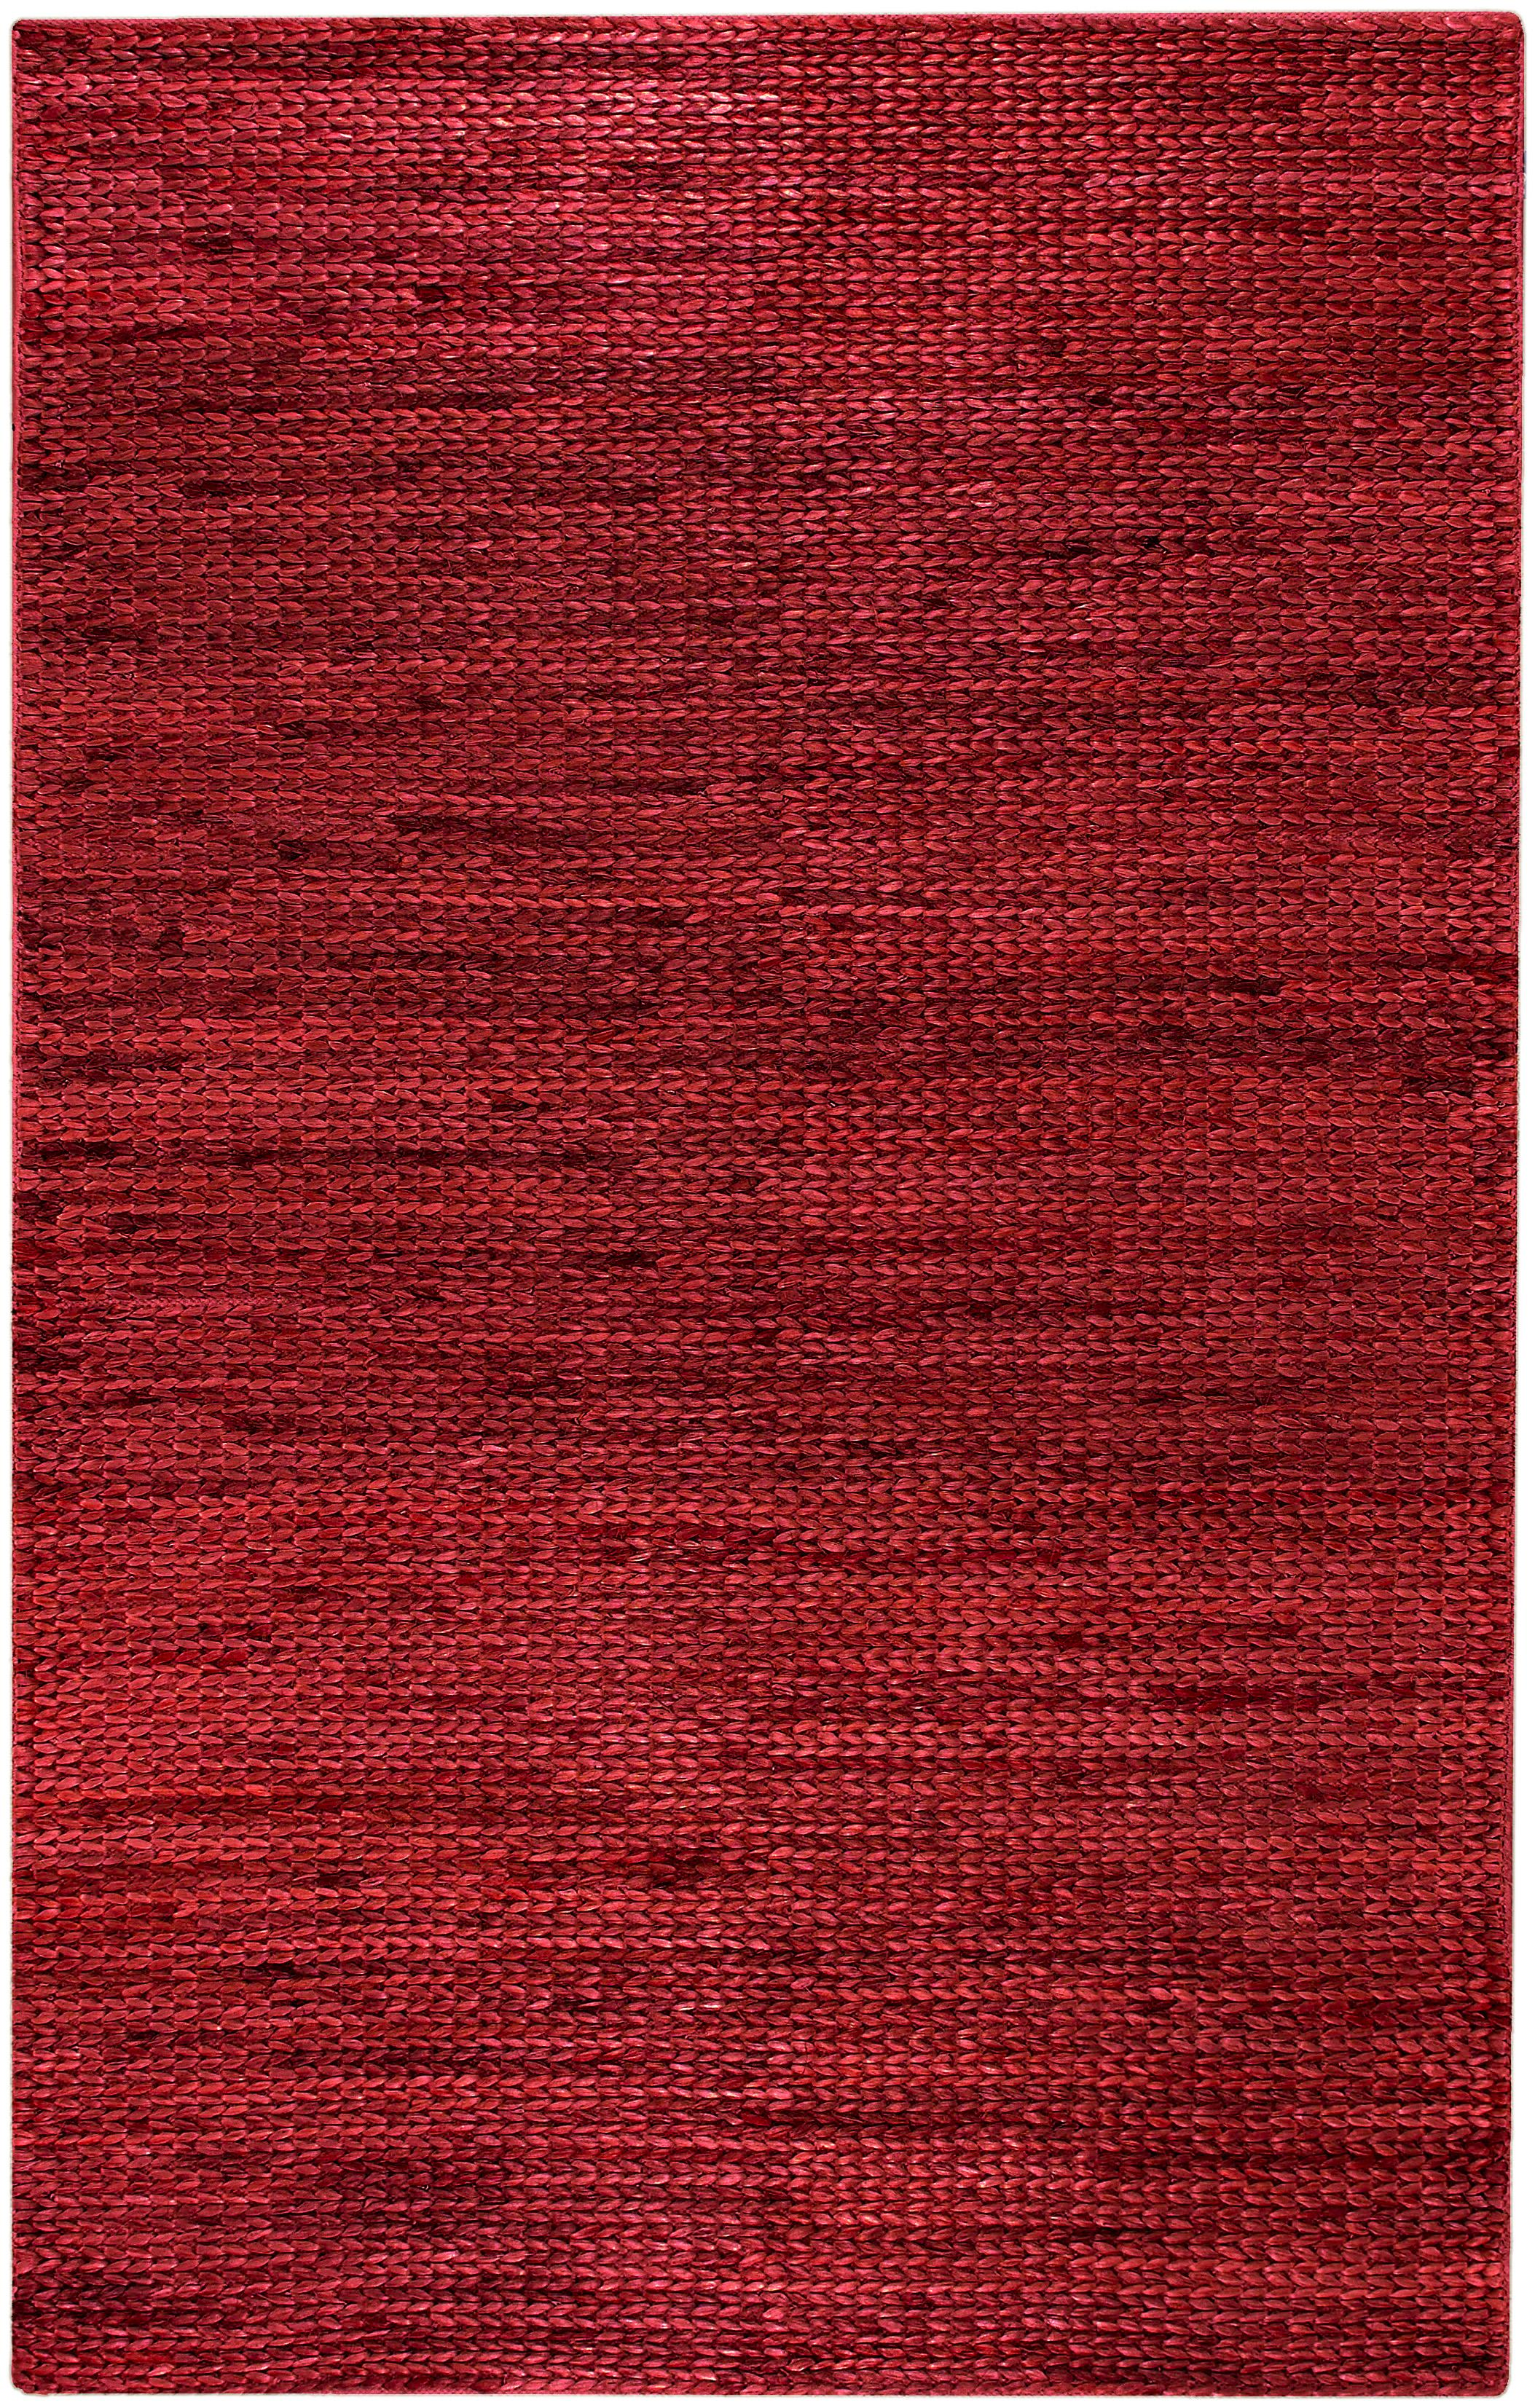 Surya Rugs Tropics 5' x 8' - Item Number: TRO1028-58